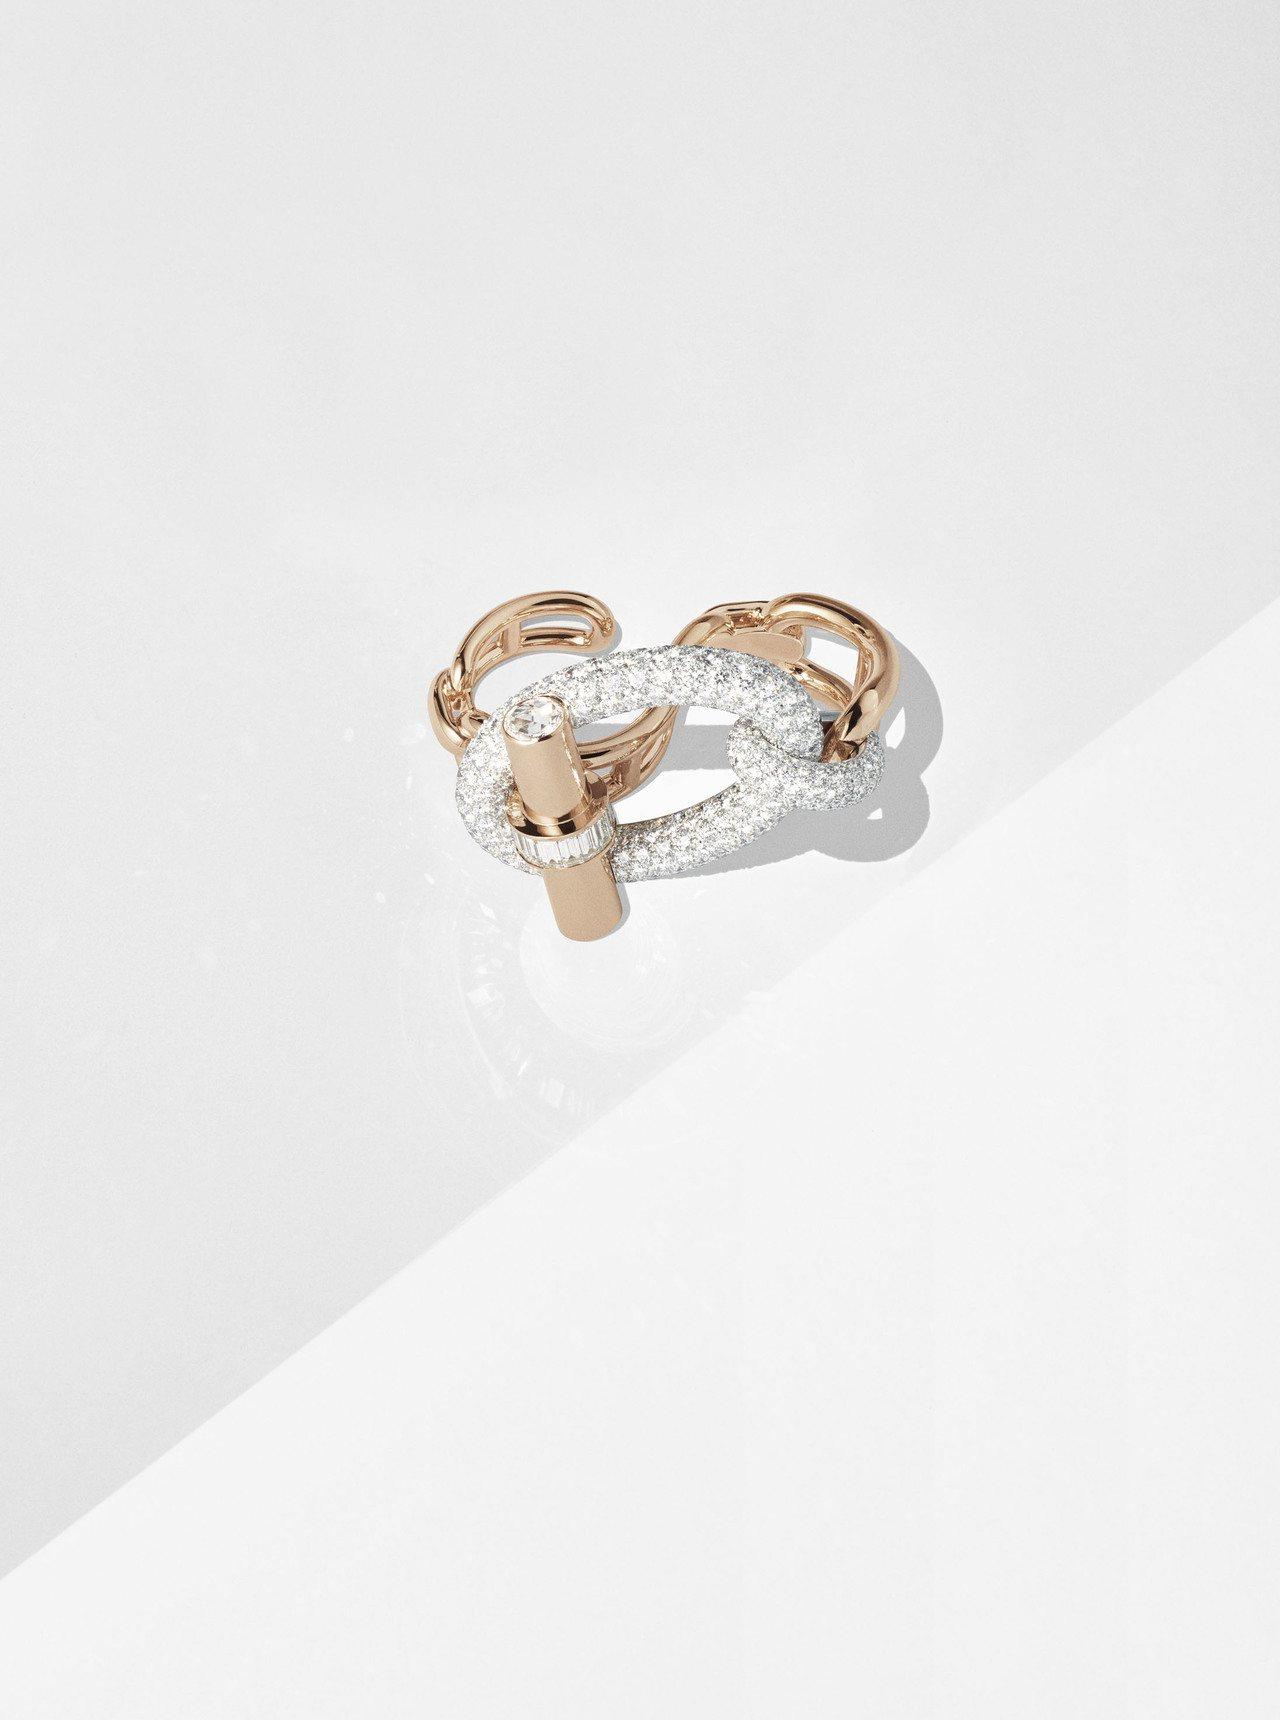 Adage Hermès玫瑰金與白K金鑲白鑽雙指戒指,417萬5,100元。圖/...